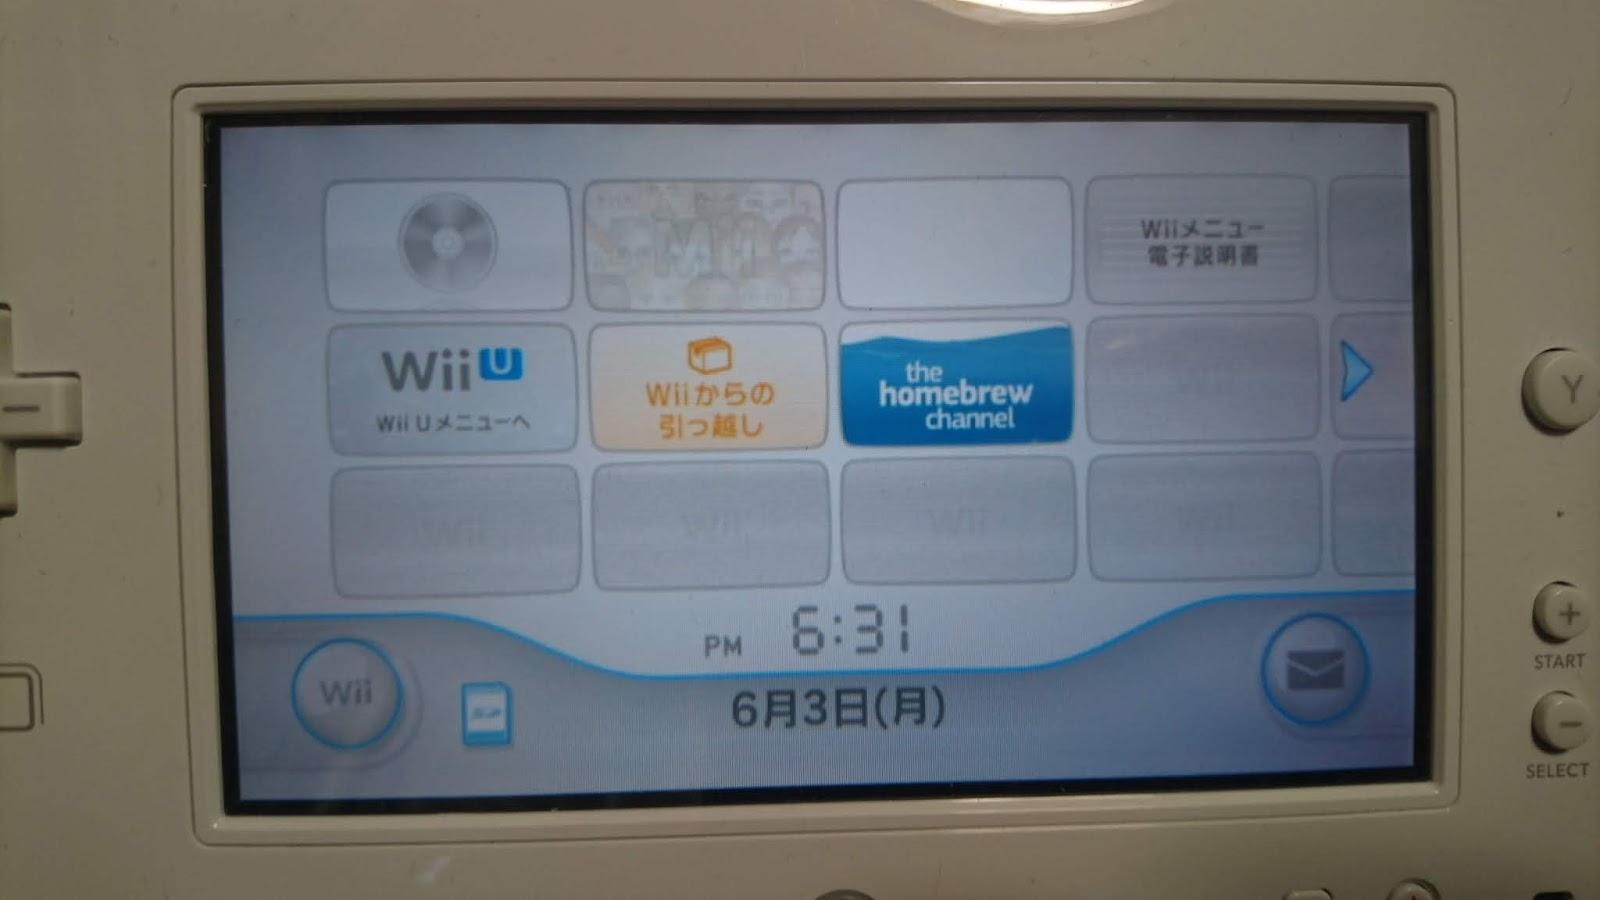 Wiiu wii ソフト